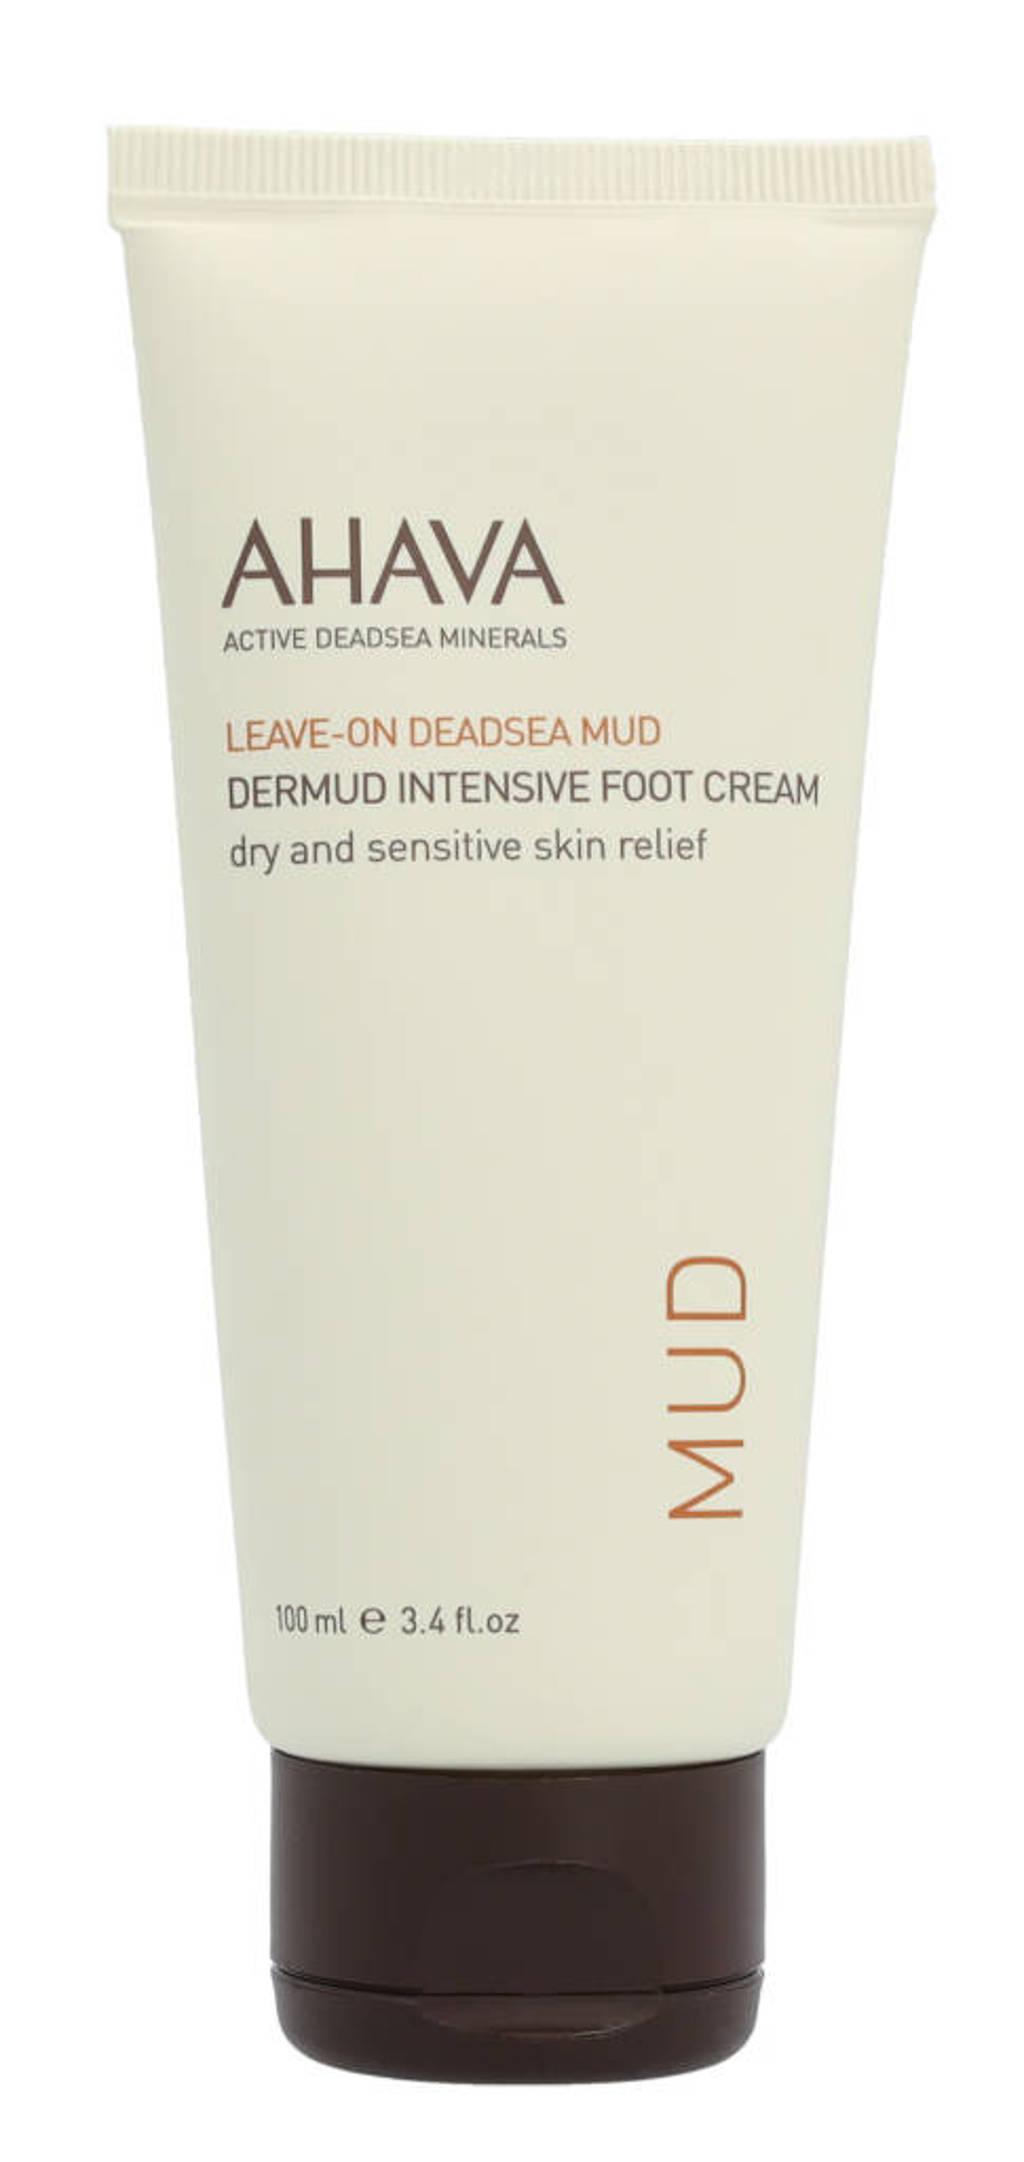 Ahava Deadsea Mud Dermud Intensive voetcrème